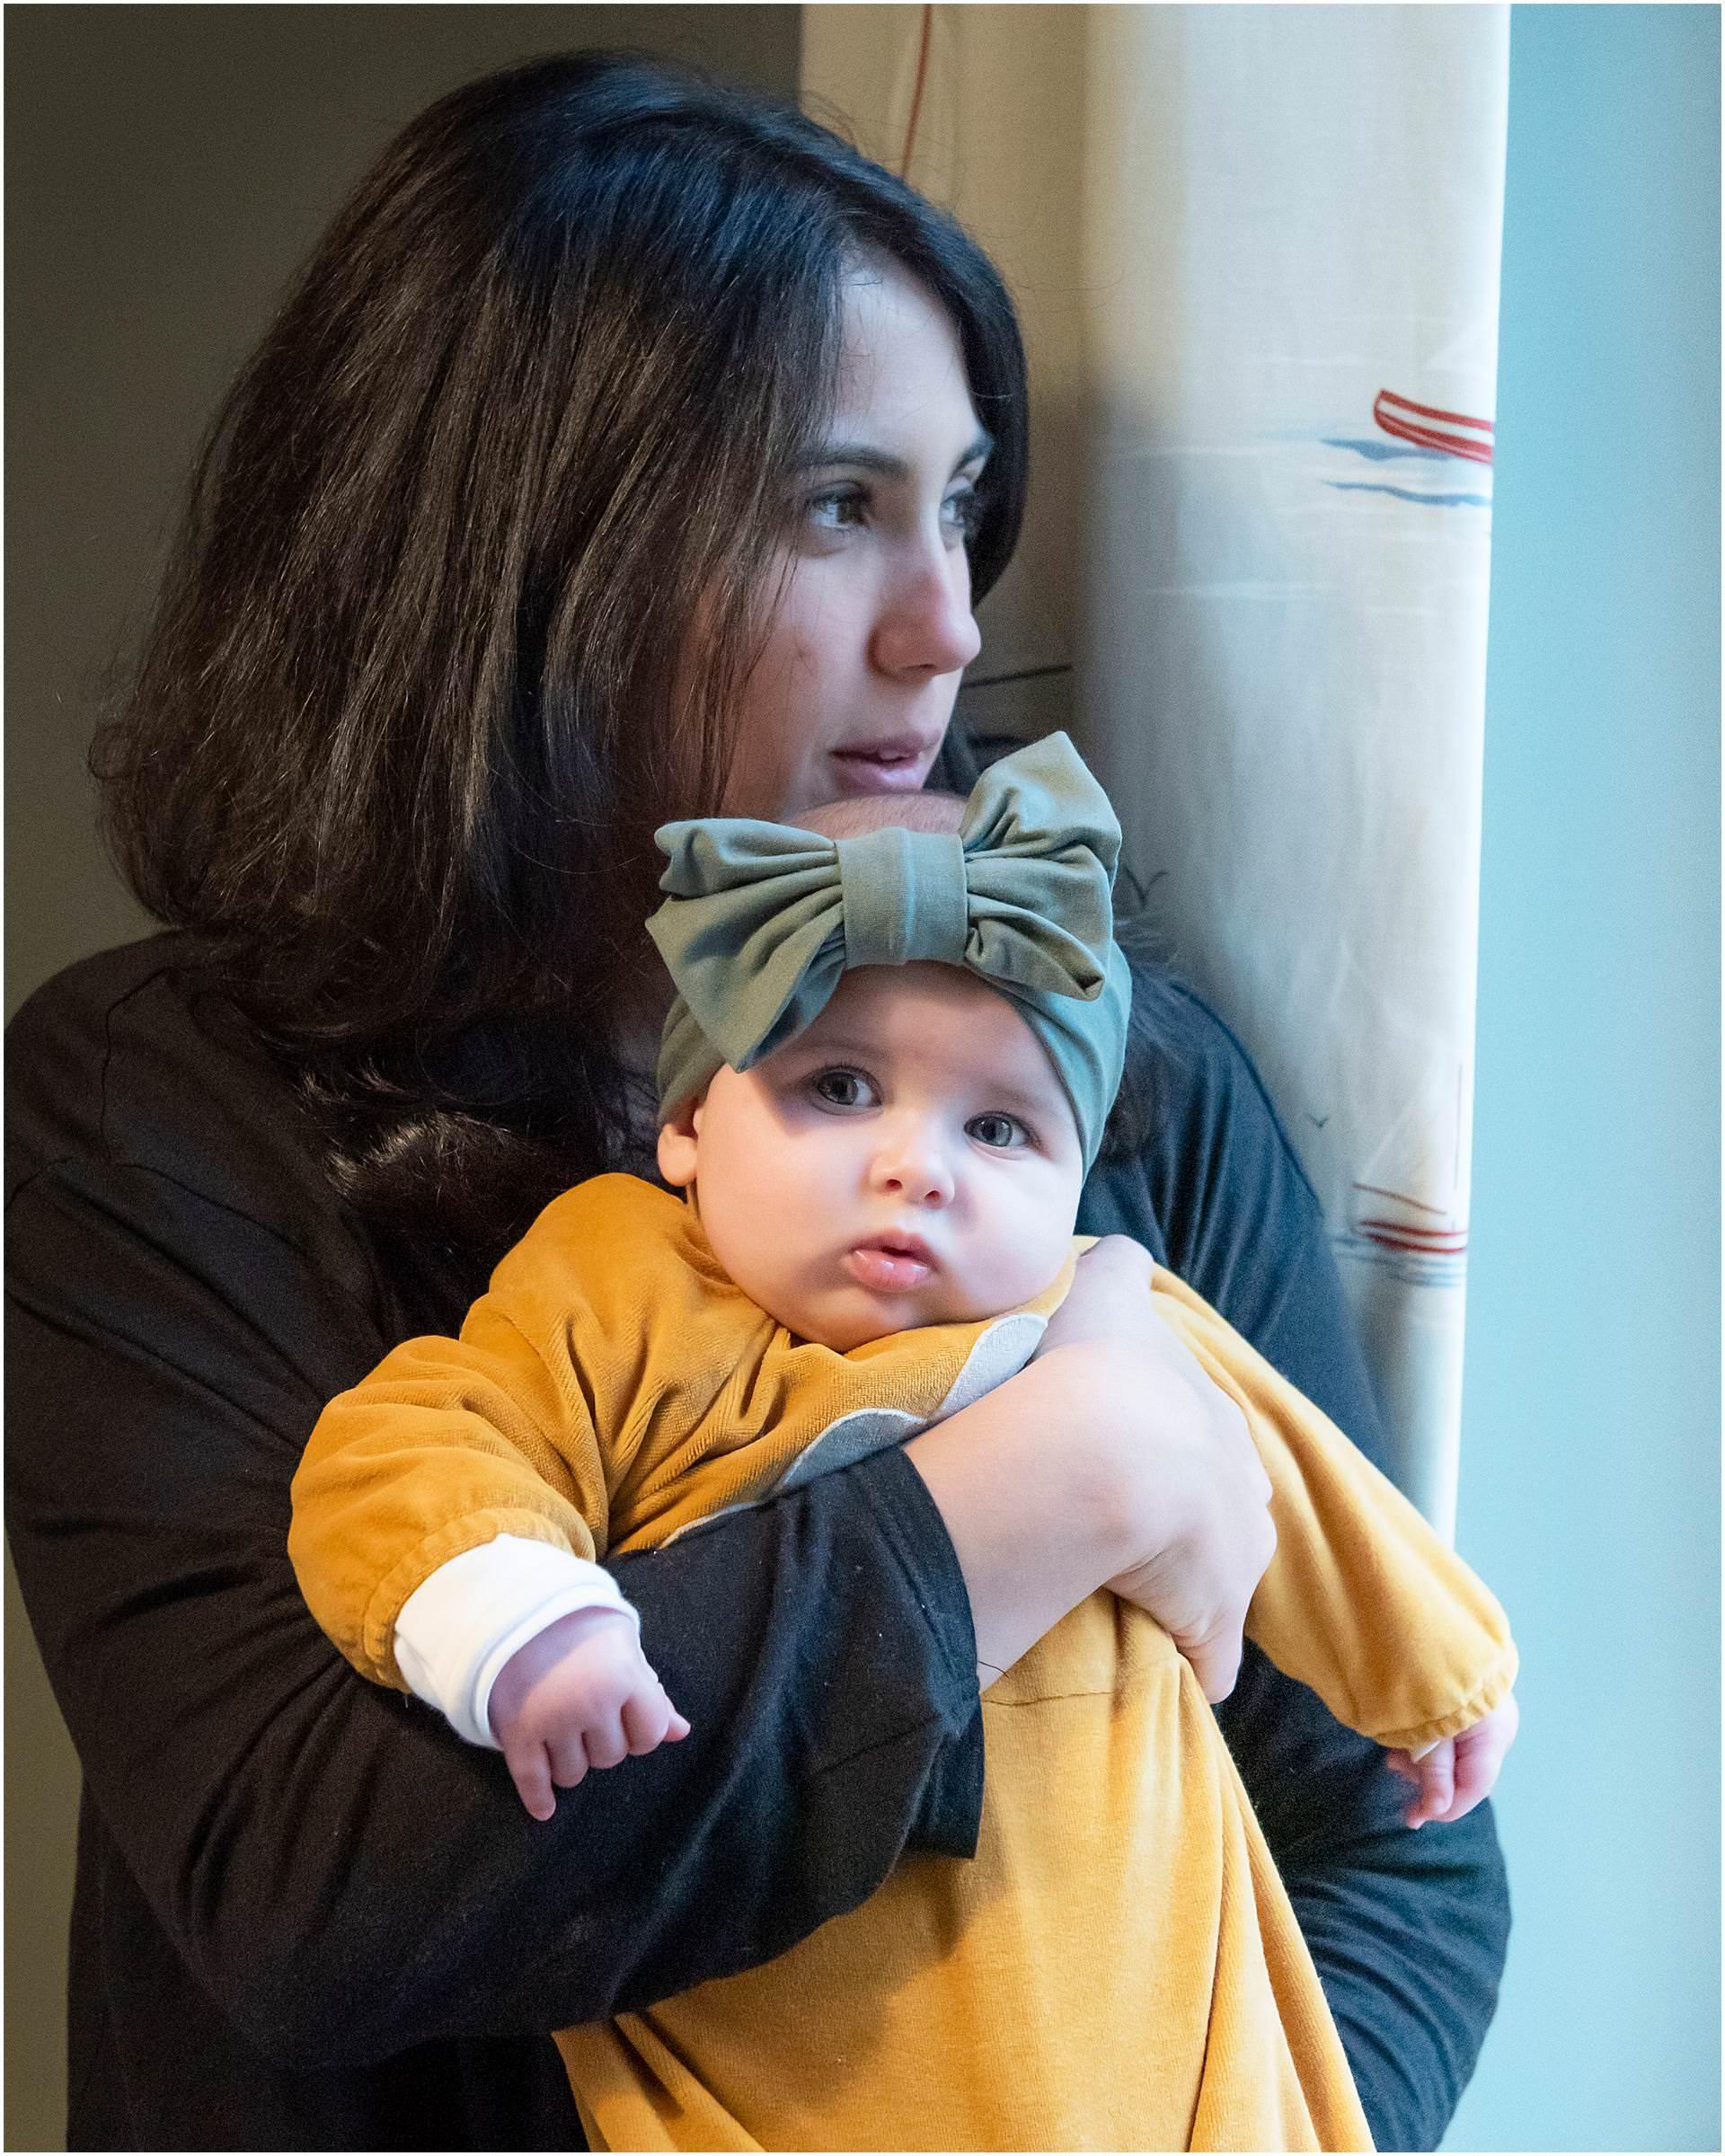 Newborn_photography with Sarah_bee_photography lifestyle_photography family_photography natural_photography photography_in_your_own_home baby_and_child_photography_1943.jpg